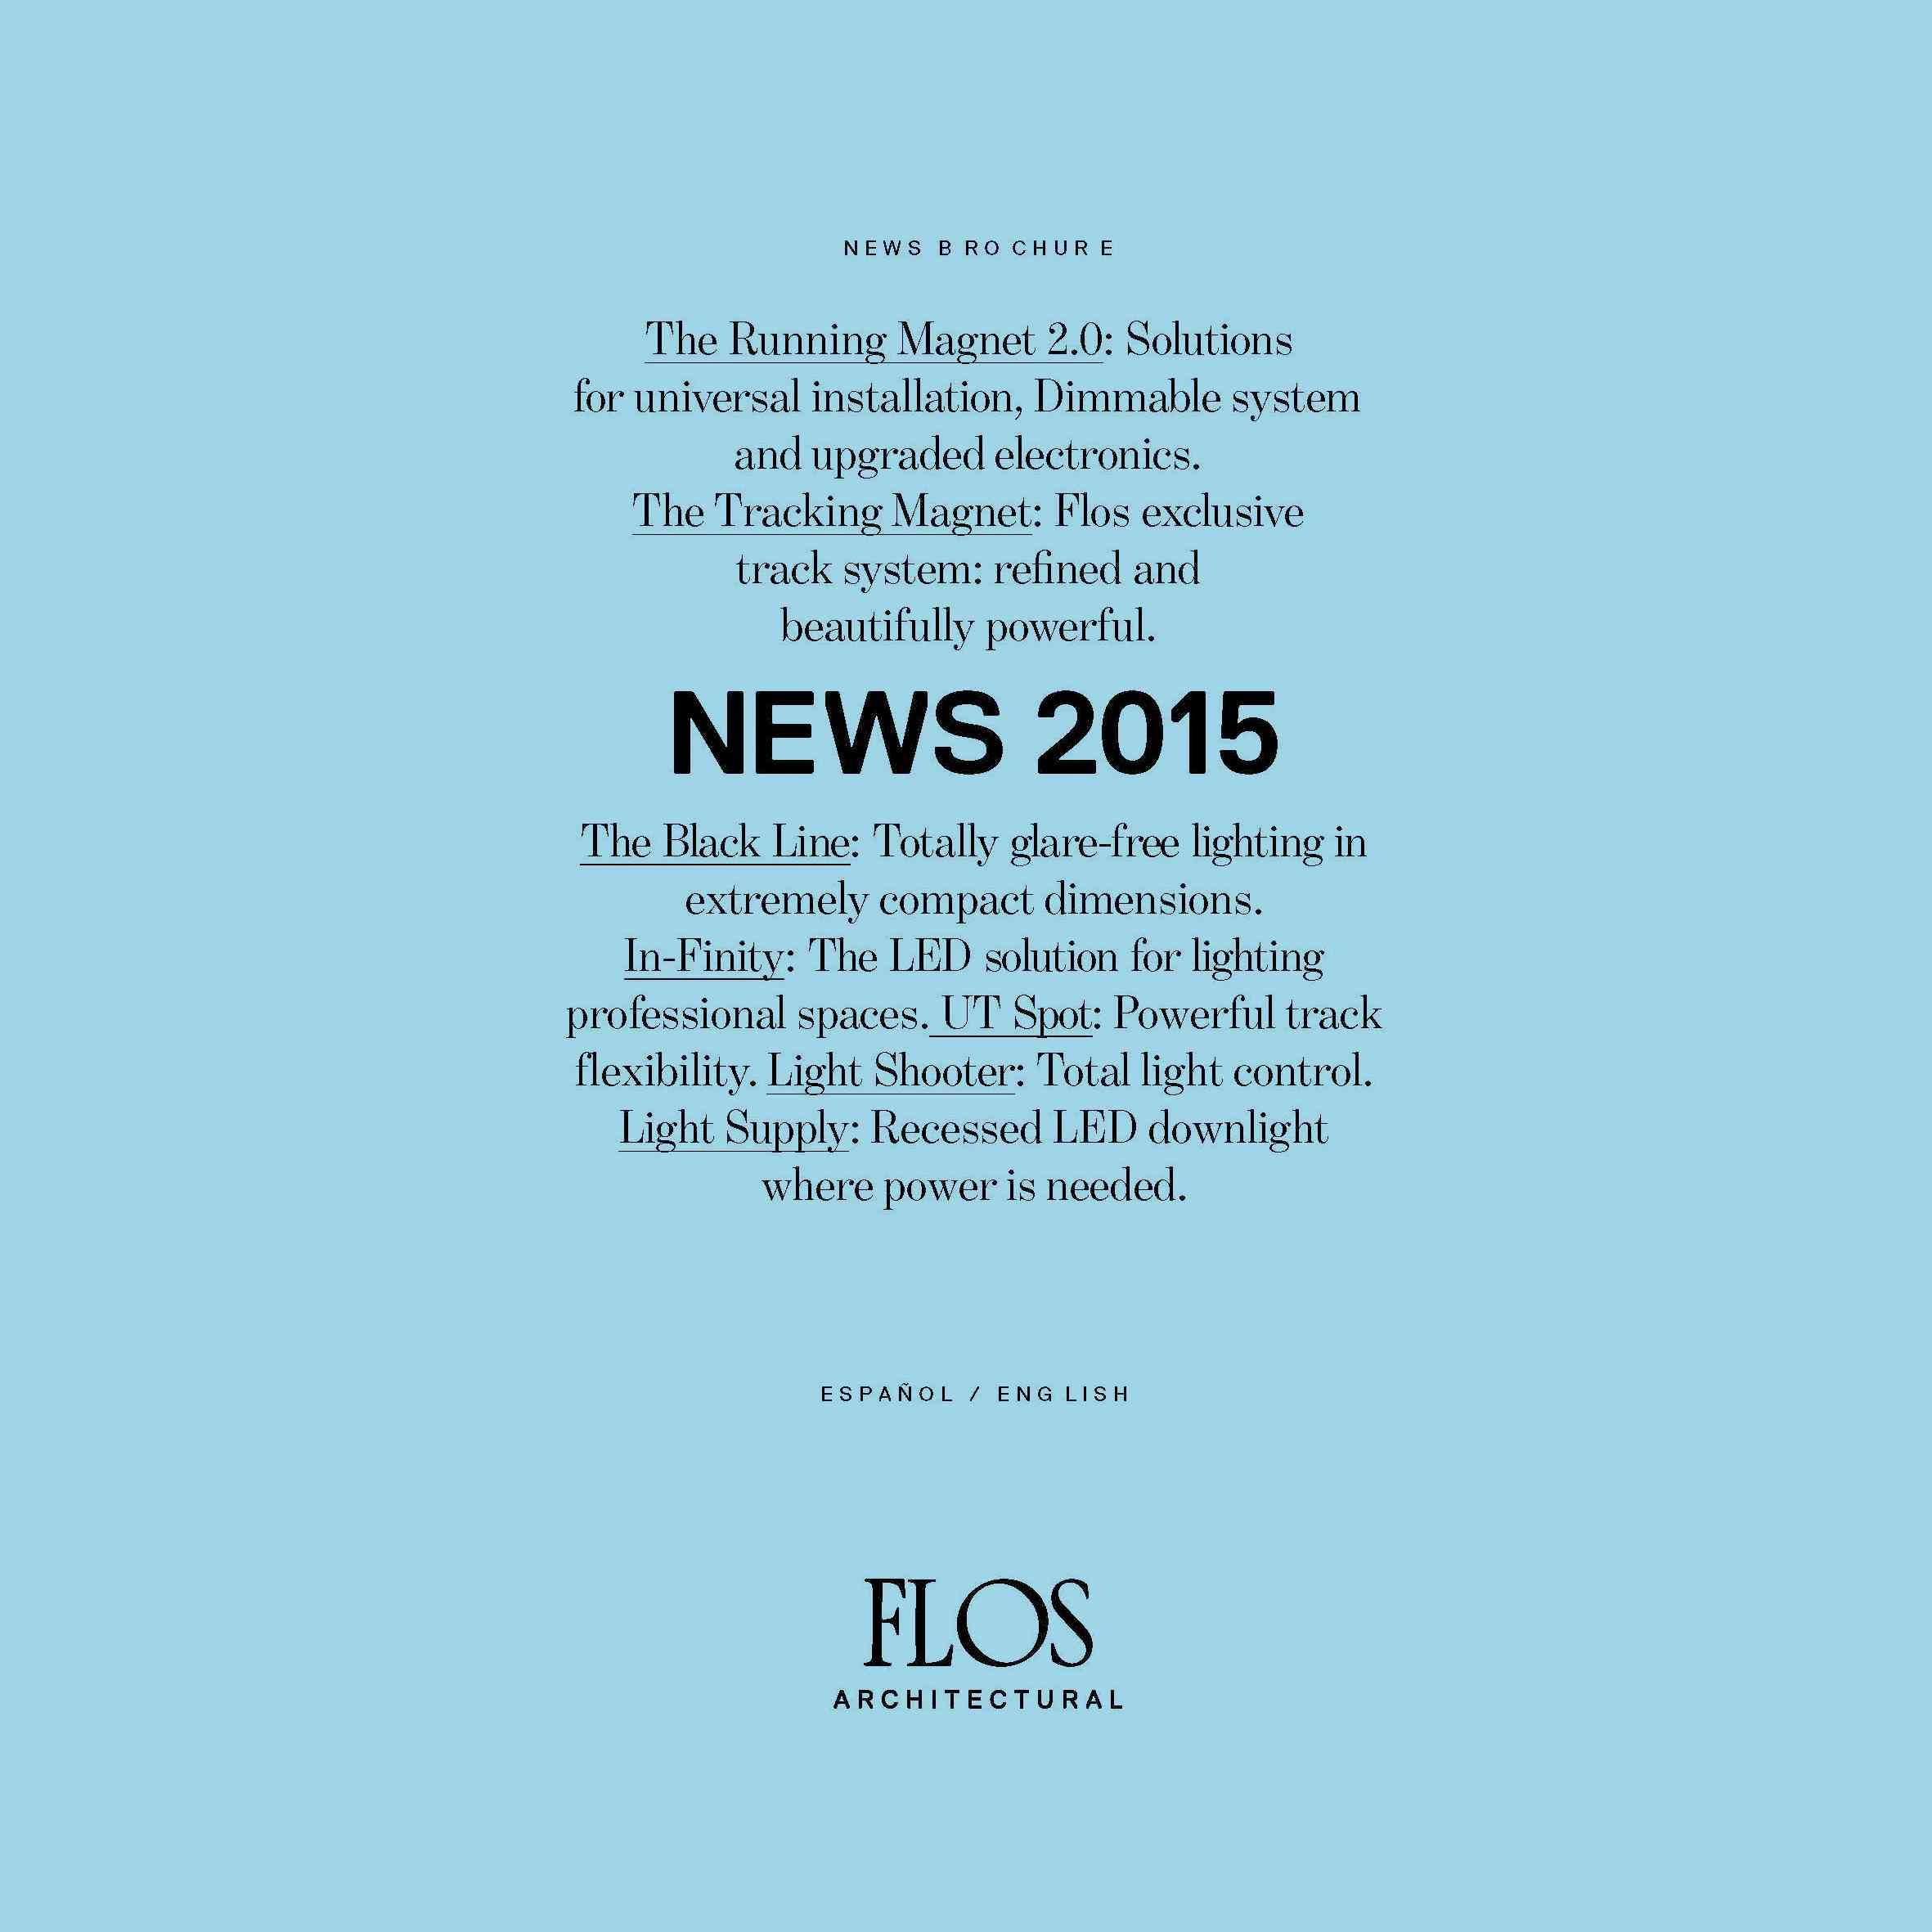 arch-news-2015.jpg